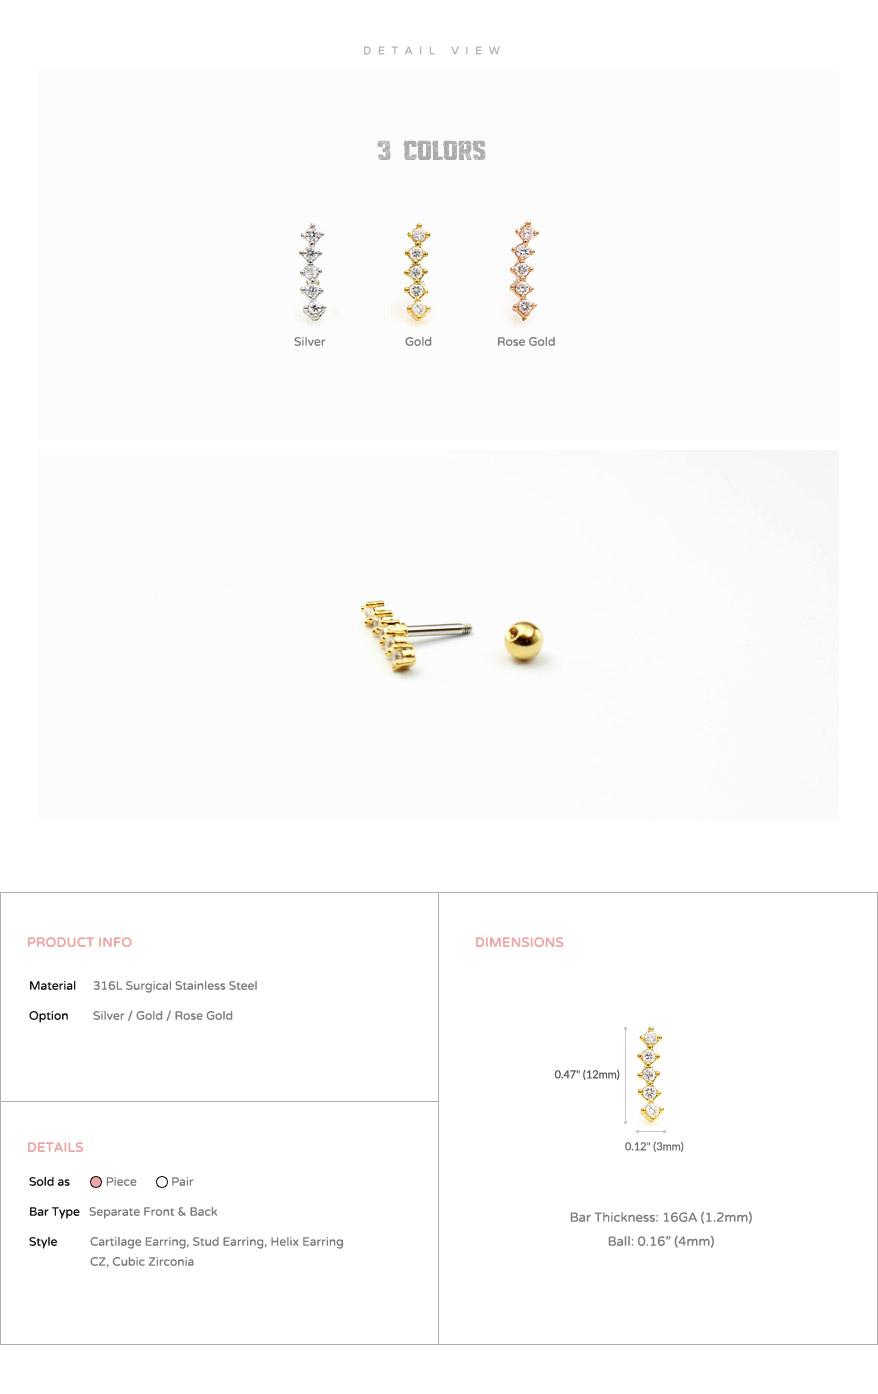 jewelry_earrings_stud_cartilage_piercing_16g_barbell_316l_cz_helix_earring_tragus_5